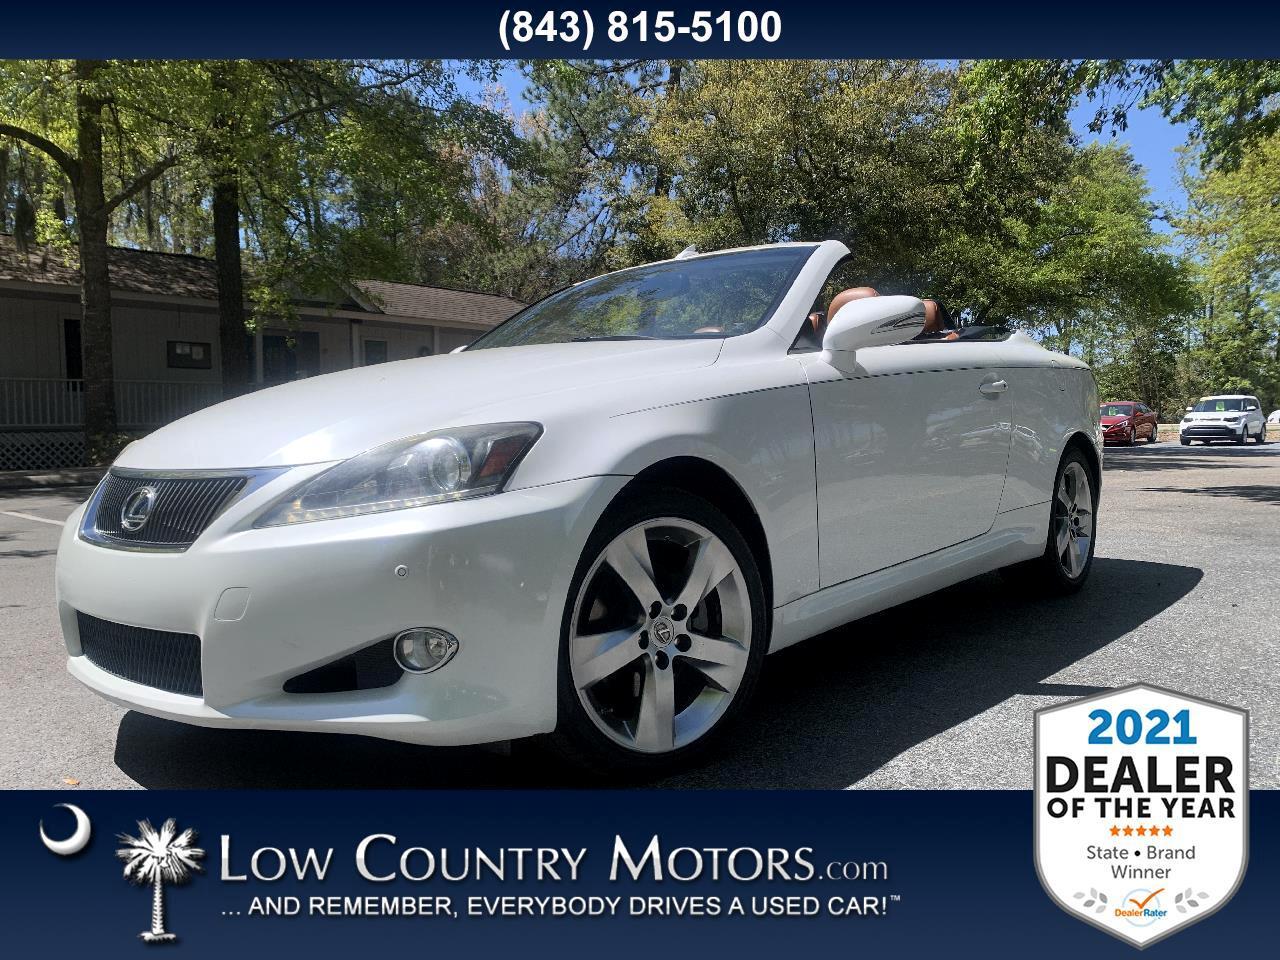 used 2011 Lexus IS 250C car, priced at $23,897